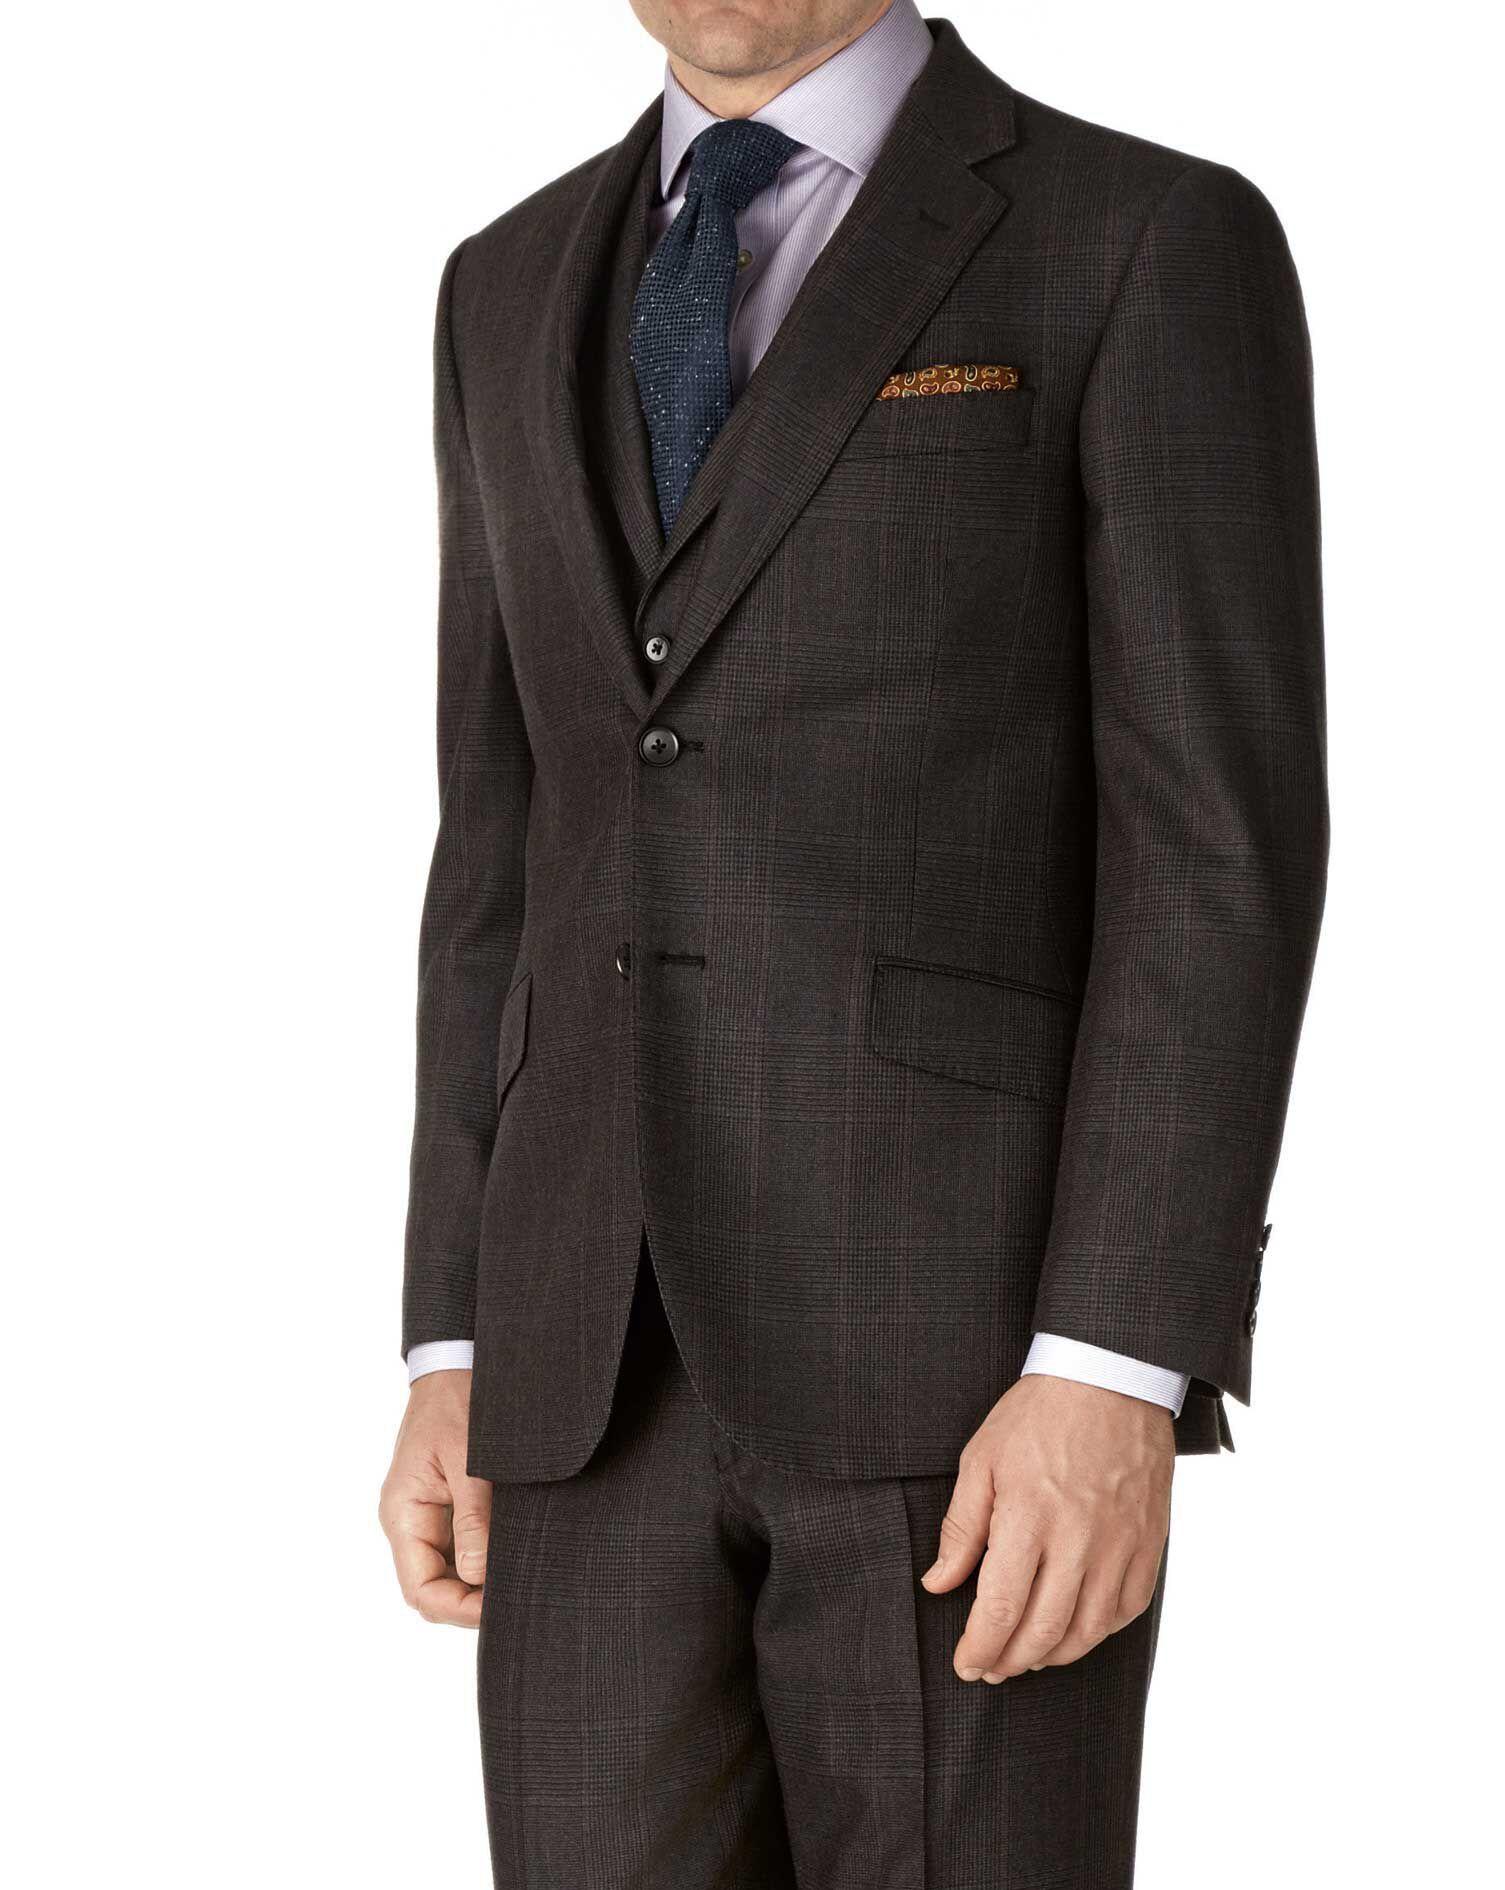 Dark Grey Classic Fit Saxony Business Suit Wool Jacket Size 42 by Charles Tyrwhitt